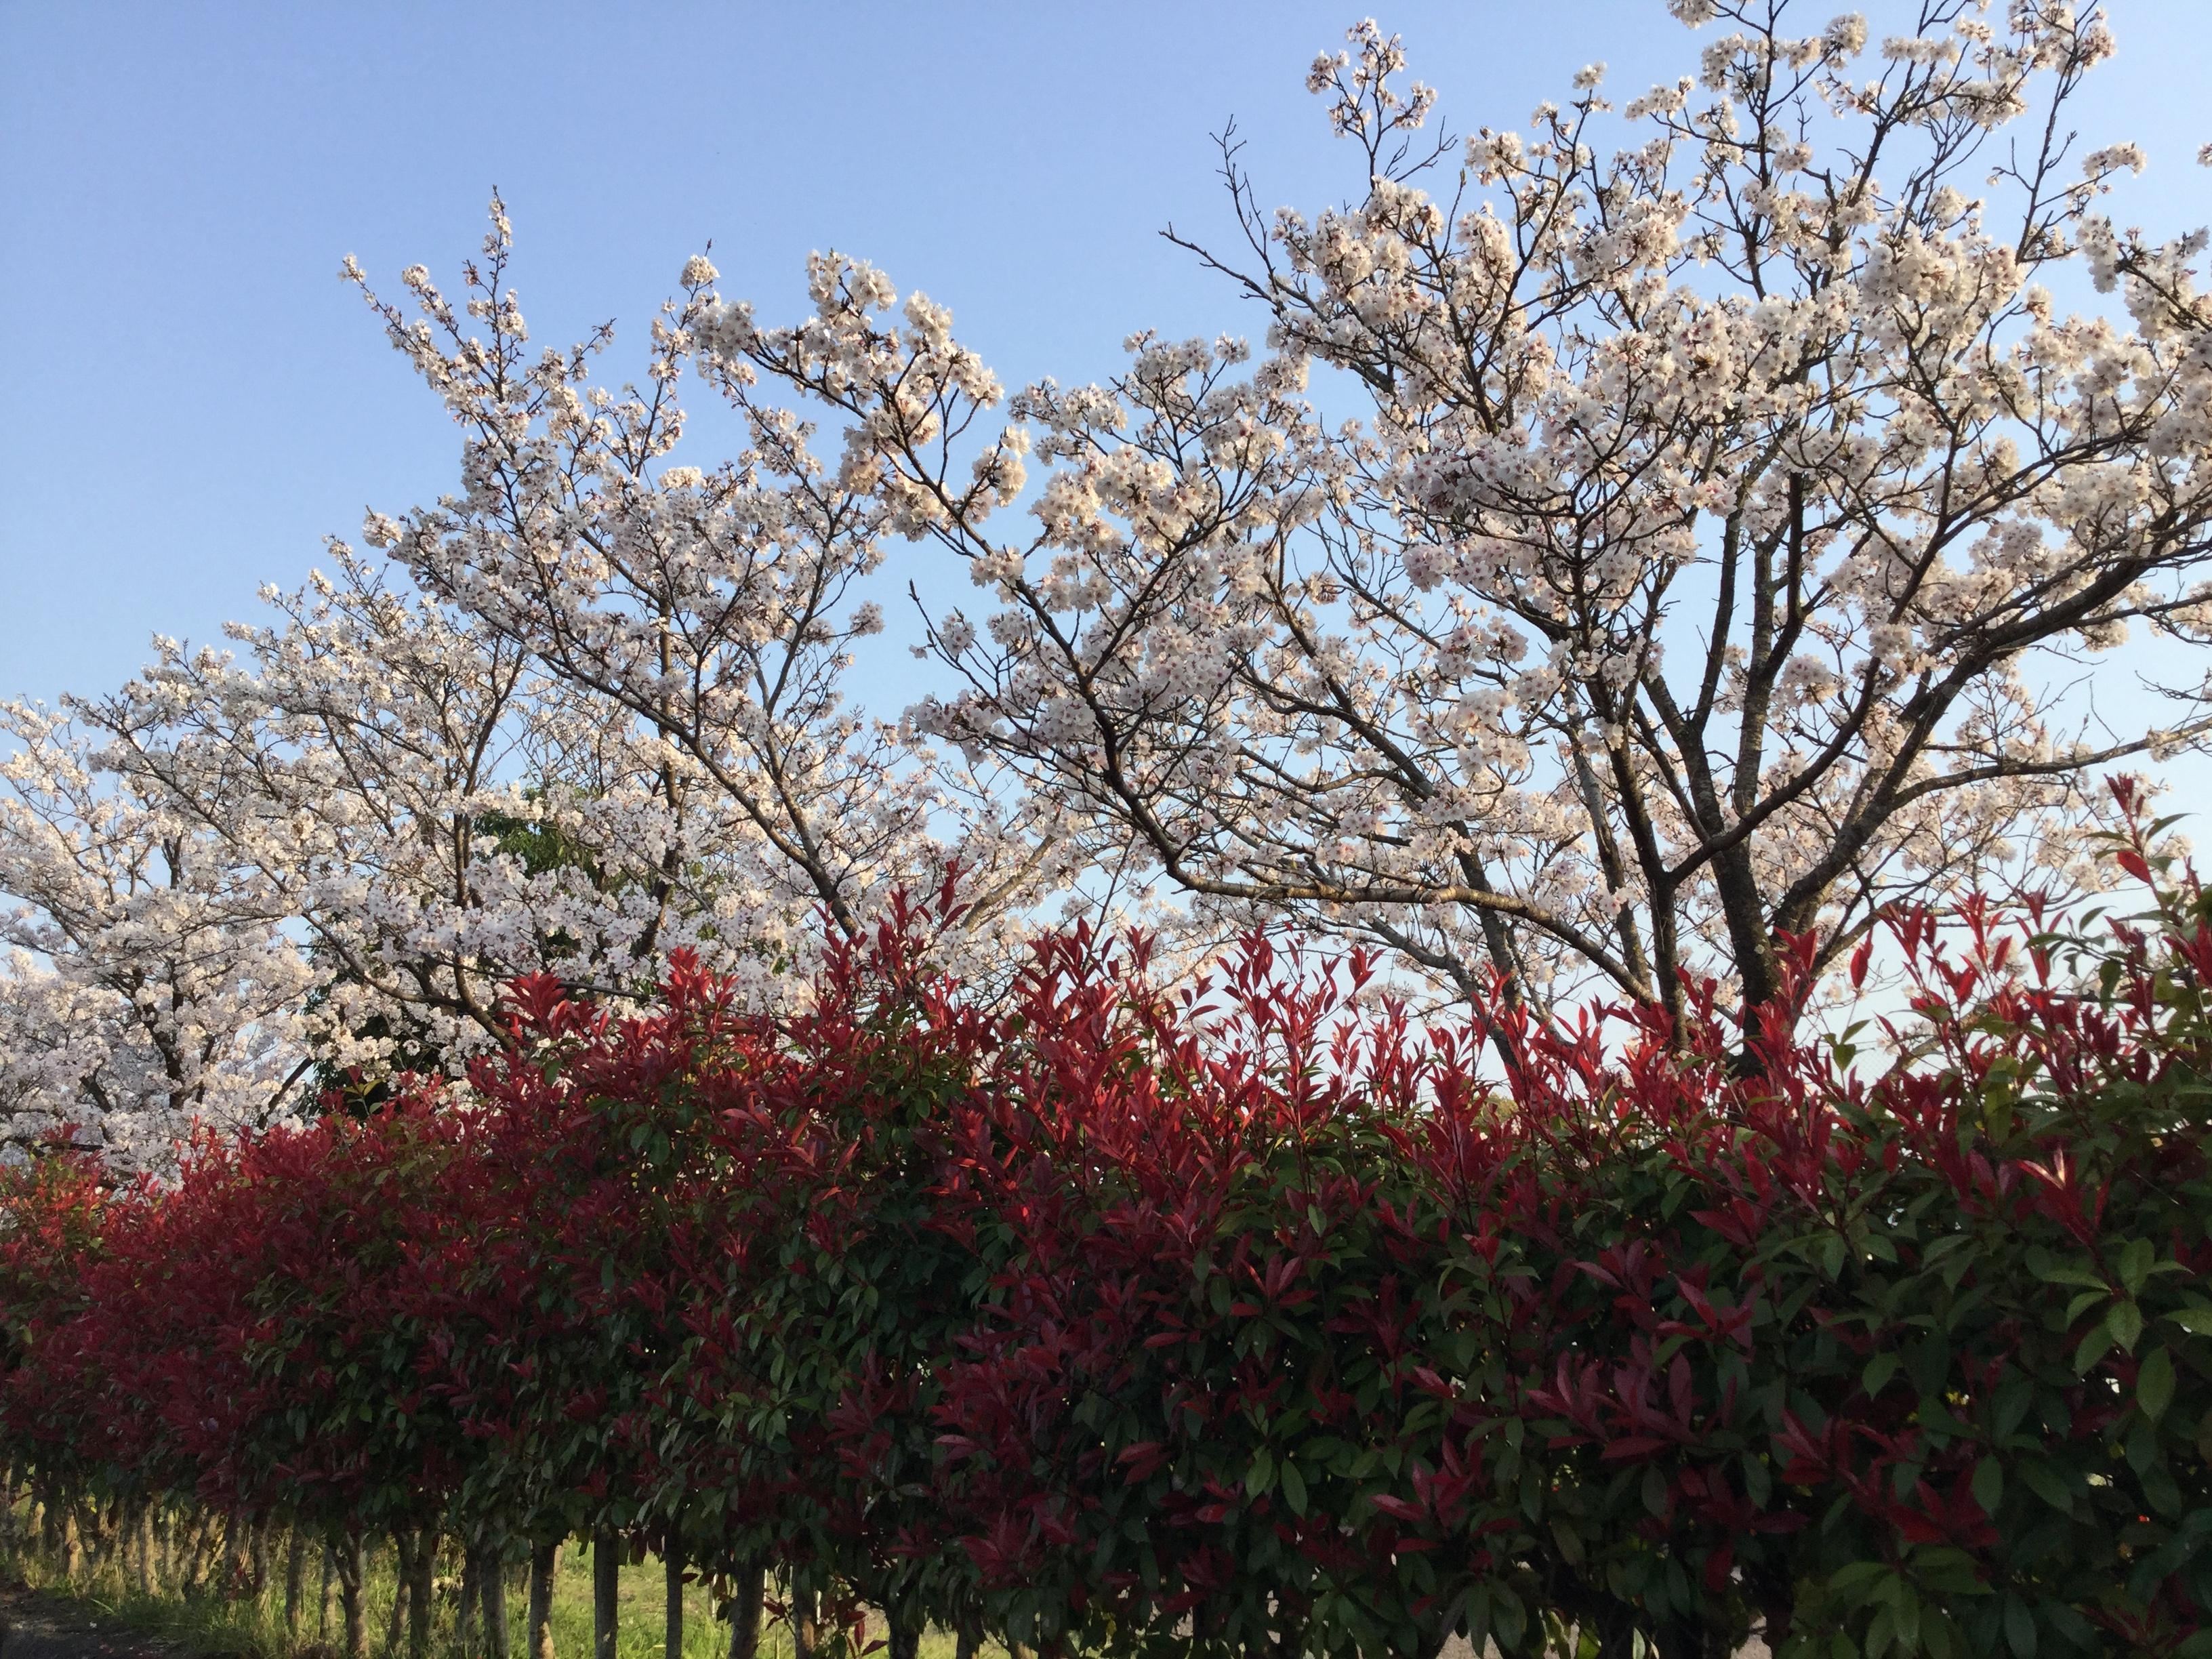 http://shikoku.misawa.co.jp/area_kouchi/SAKURA.JPG